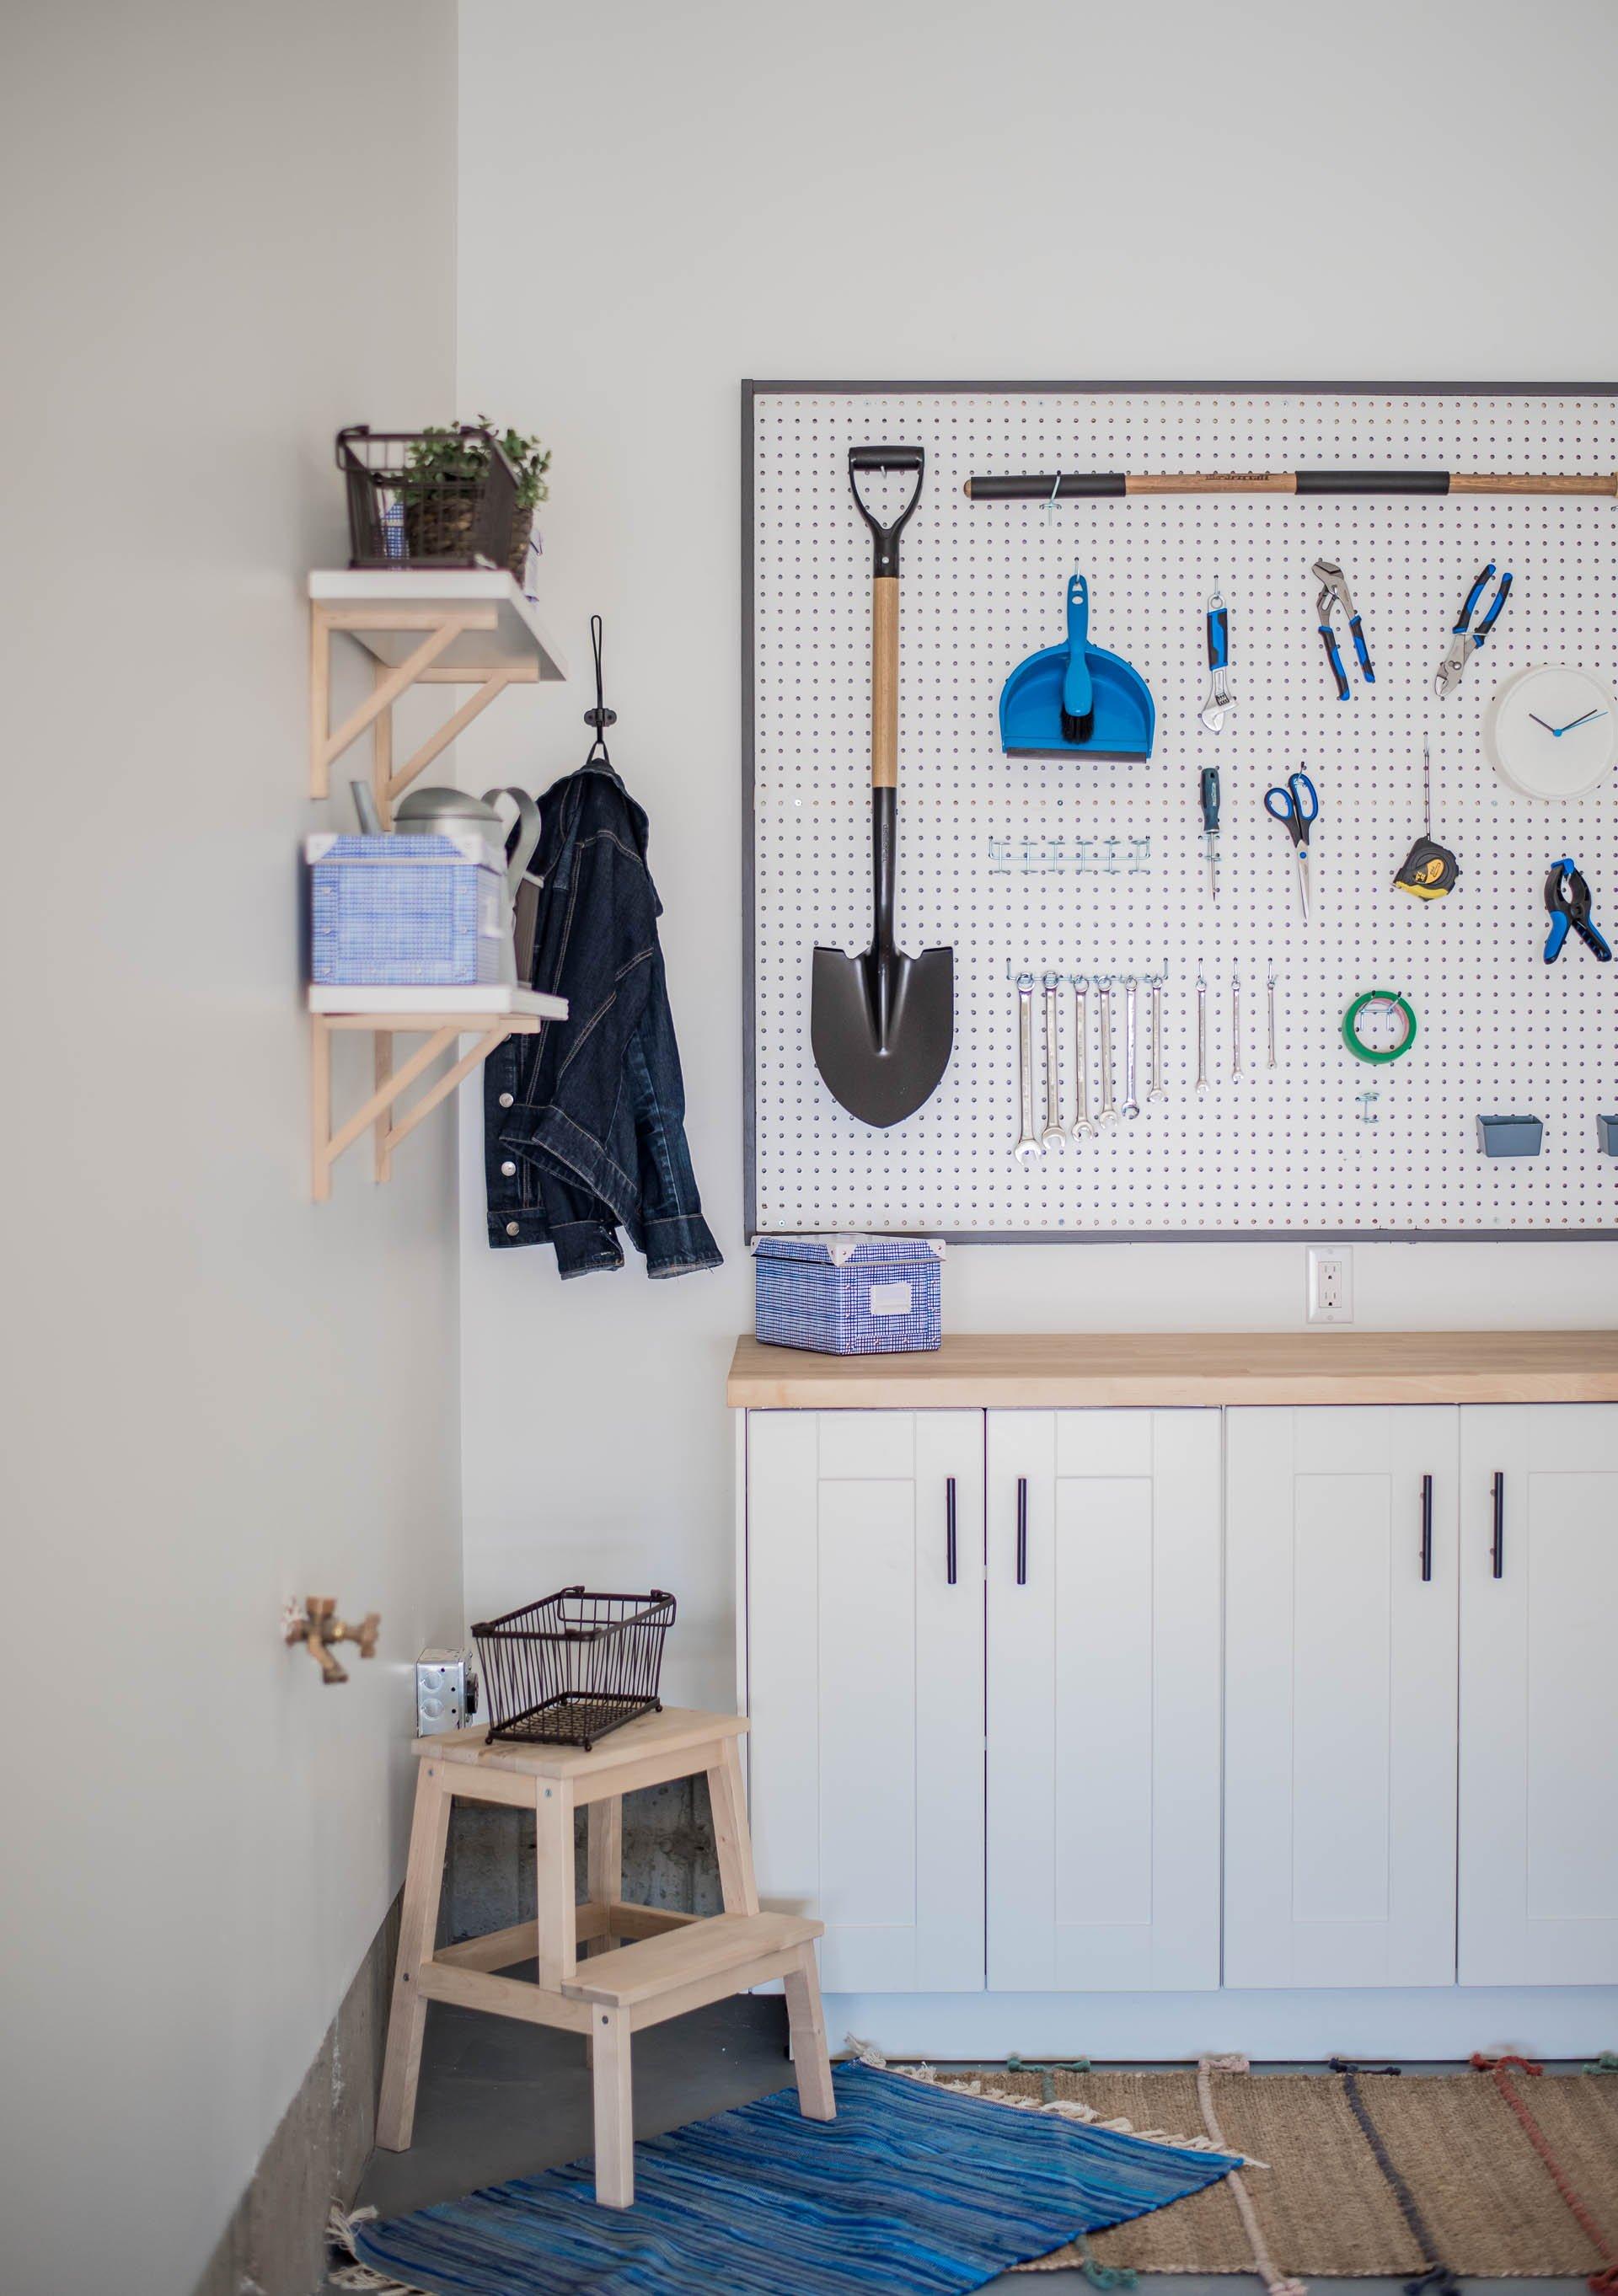 DIY Garage Work Bench and Framed Pegboard Brookfield Robson-26-1